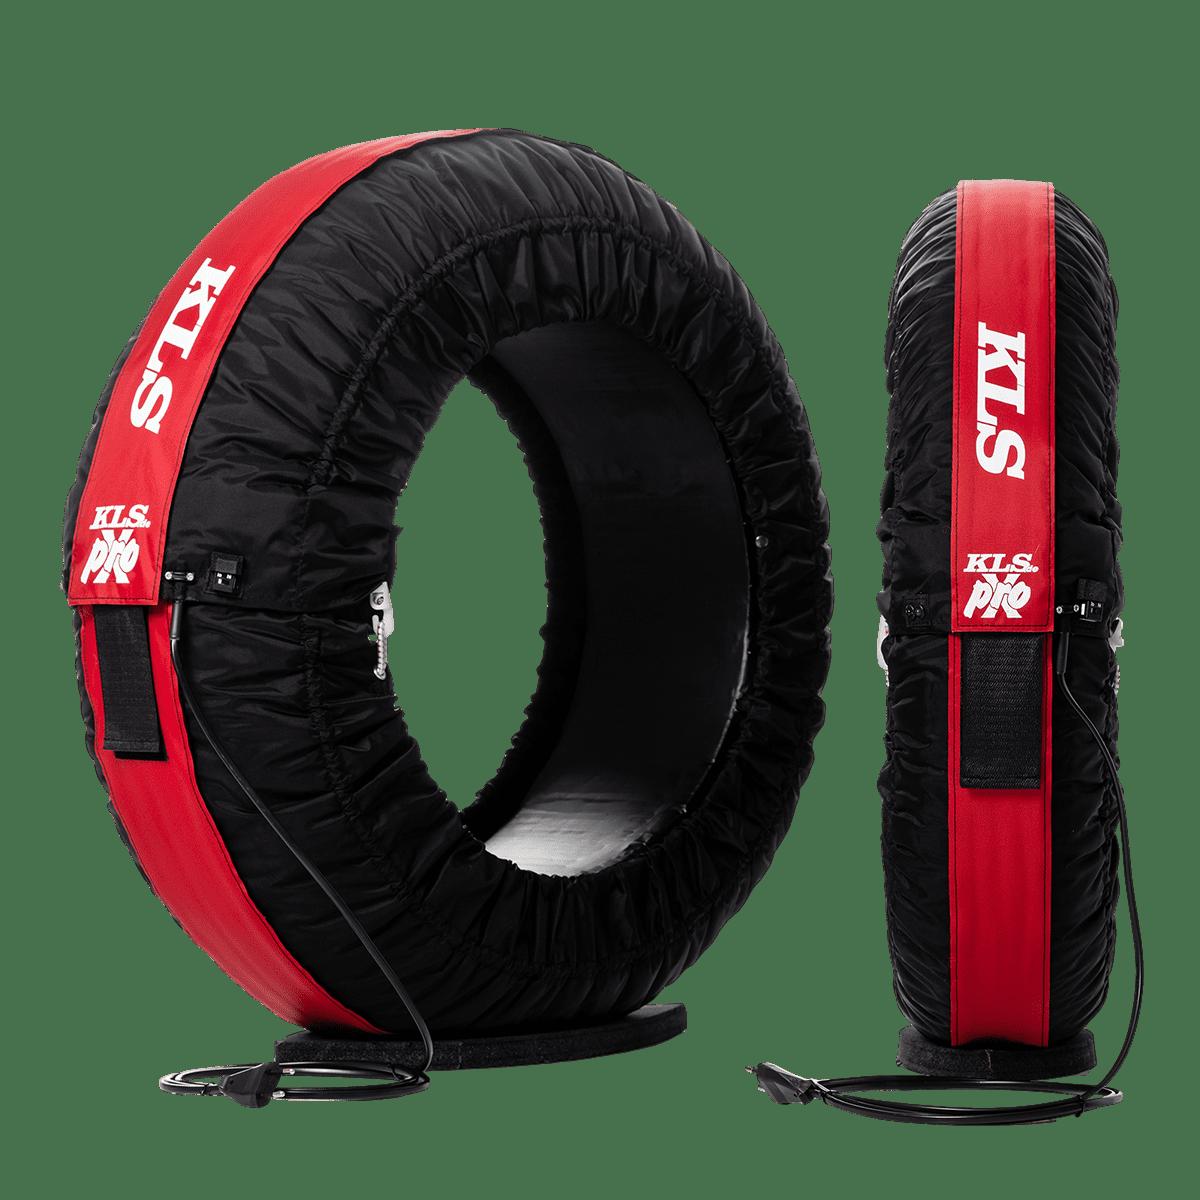 kls-reifenwaermer-moto-prox--1200x1200